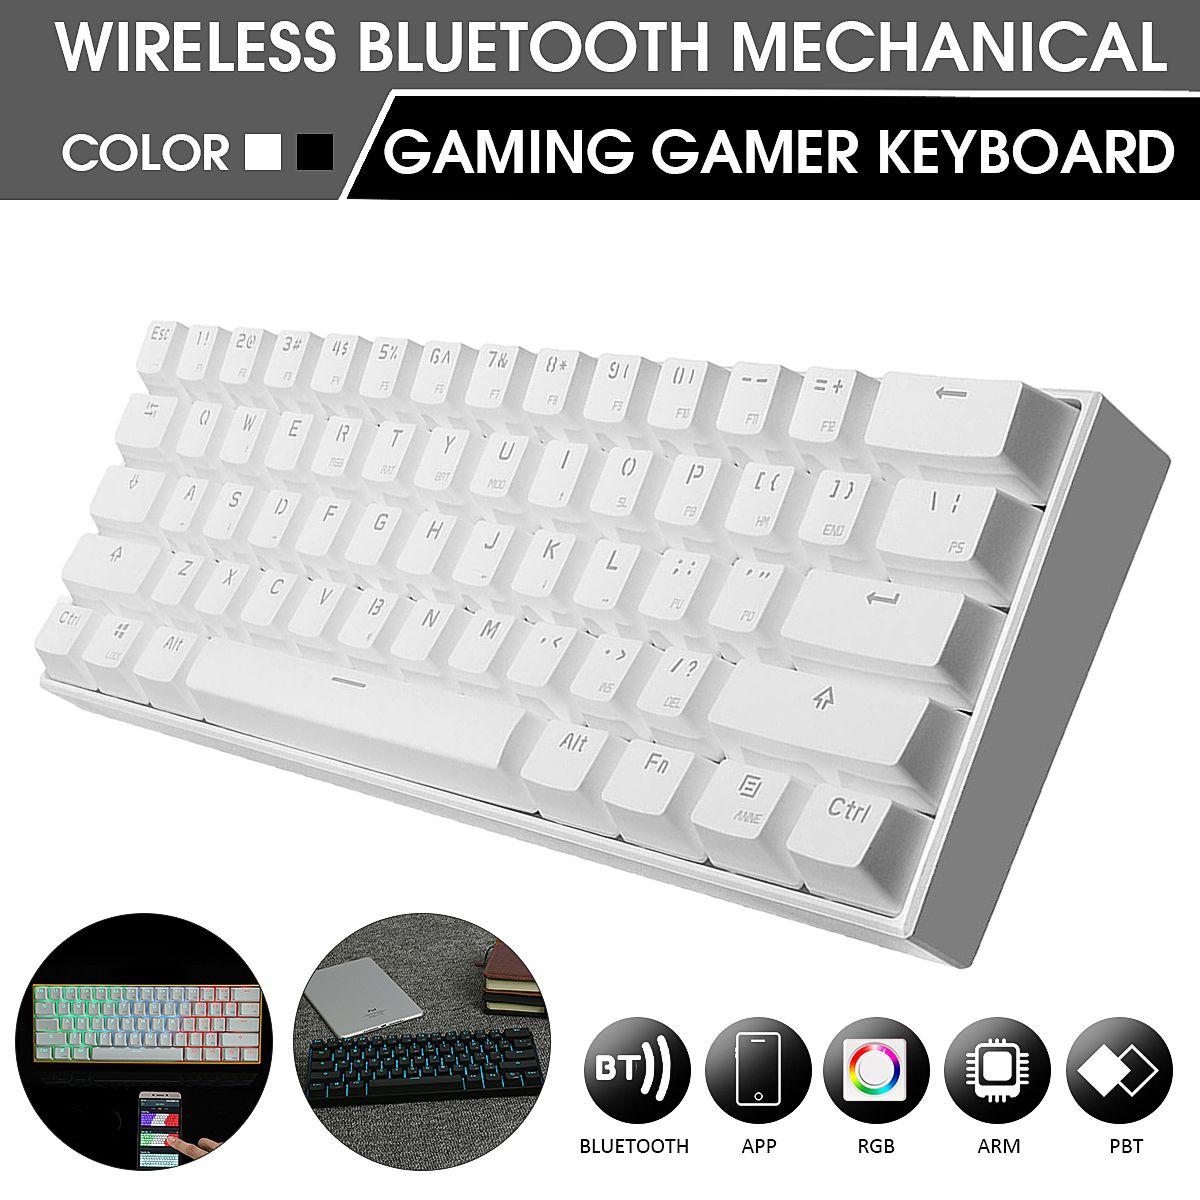 Wireless Bluetooth Mechanical Gaming Gamer Keyboard Anne PRO Brown Switch RGB Mechanical Keyboard RGB Anti-Ghosting for Computer